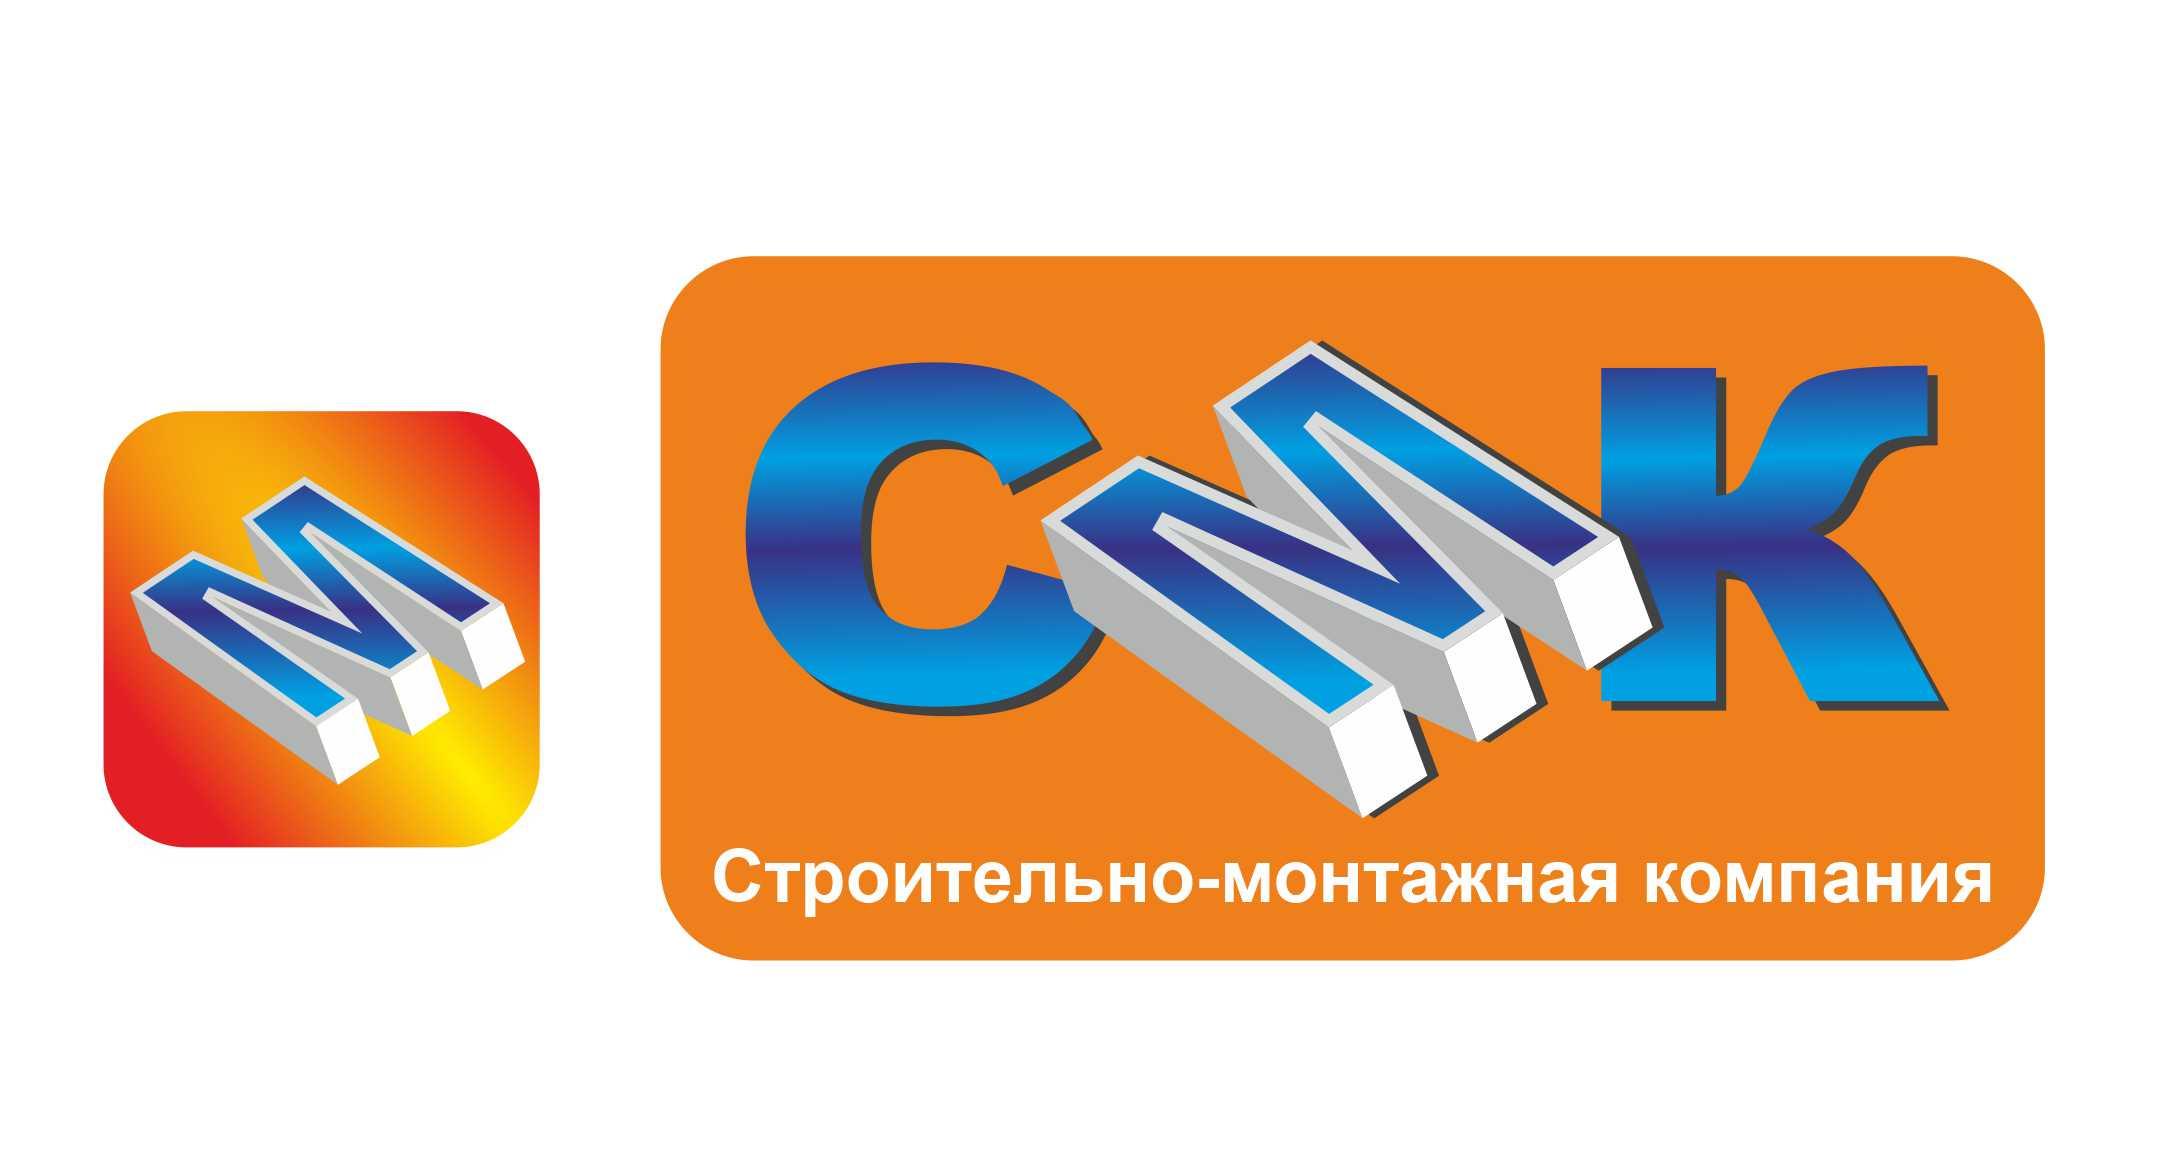 Разработка логотипа компании фото f_1265dcbd601044c1.jpg